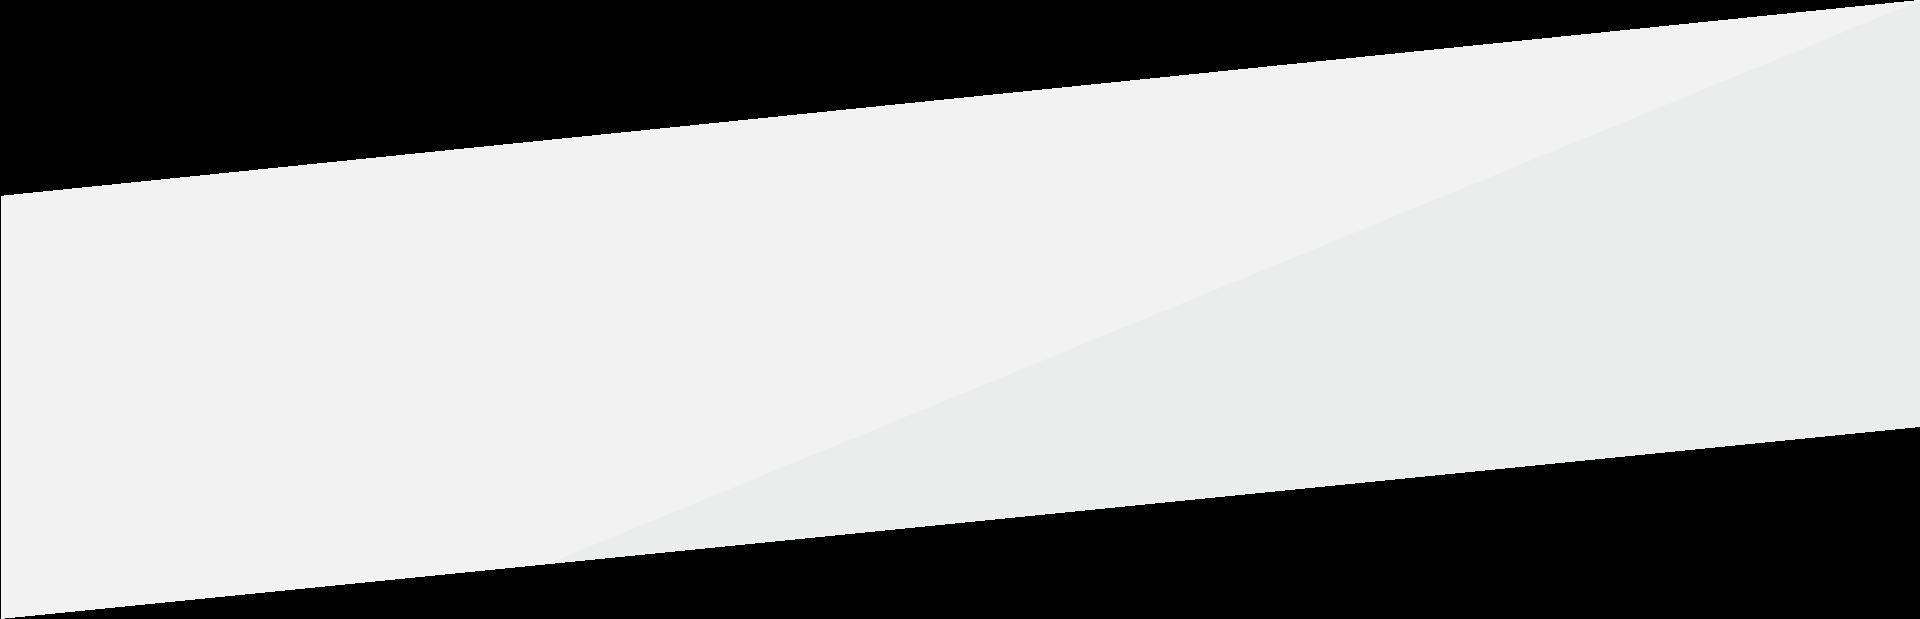 background-grey-05